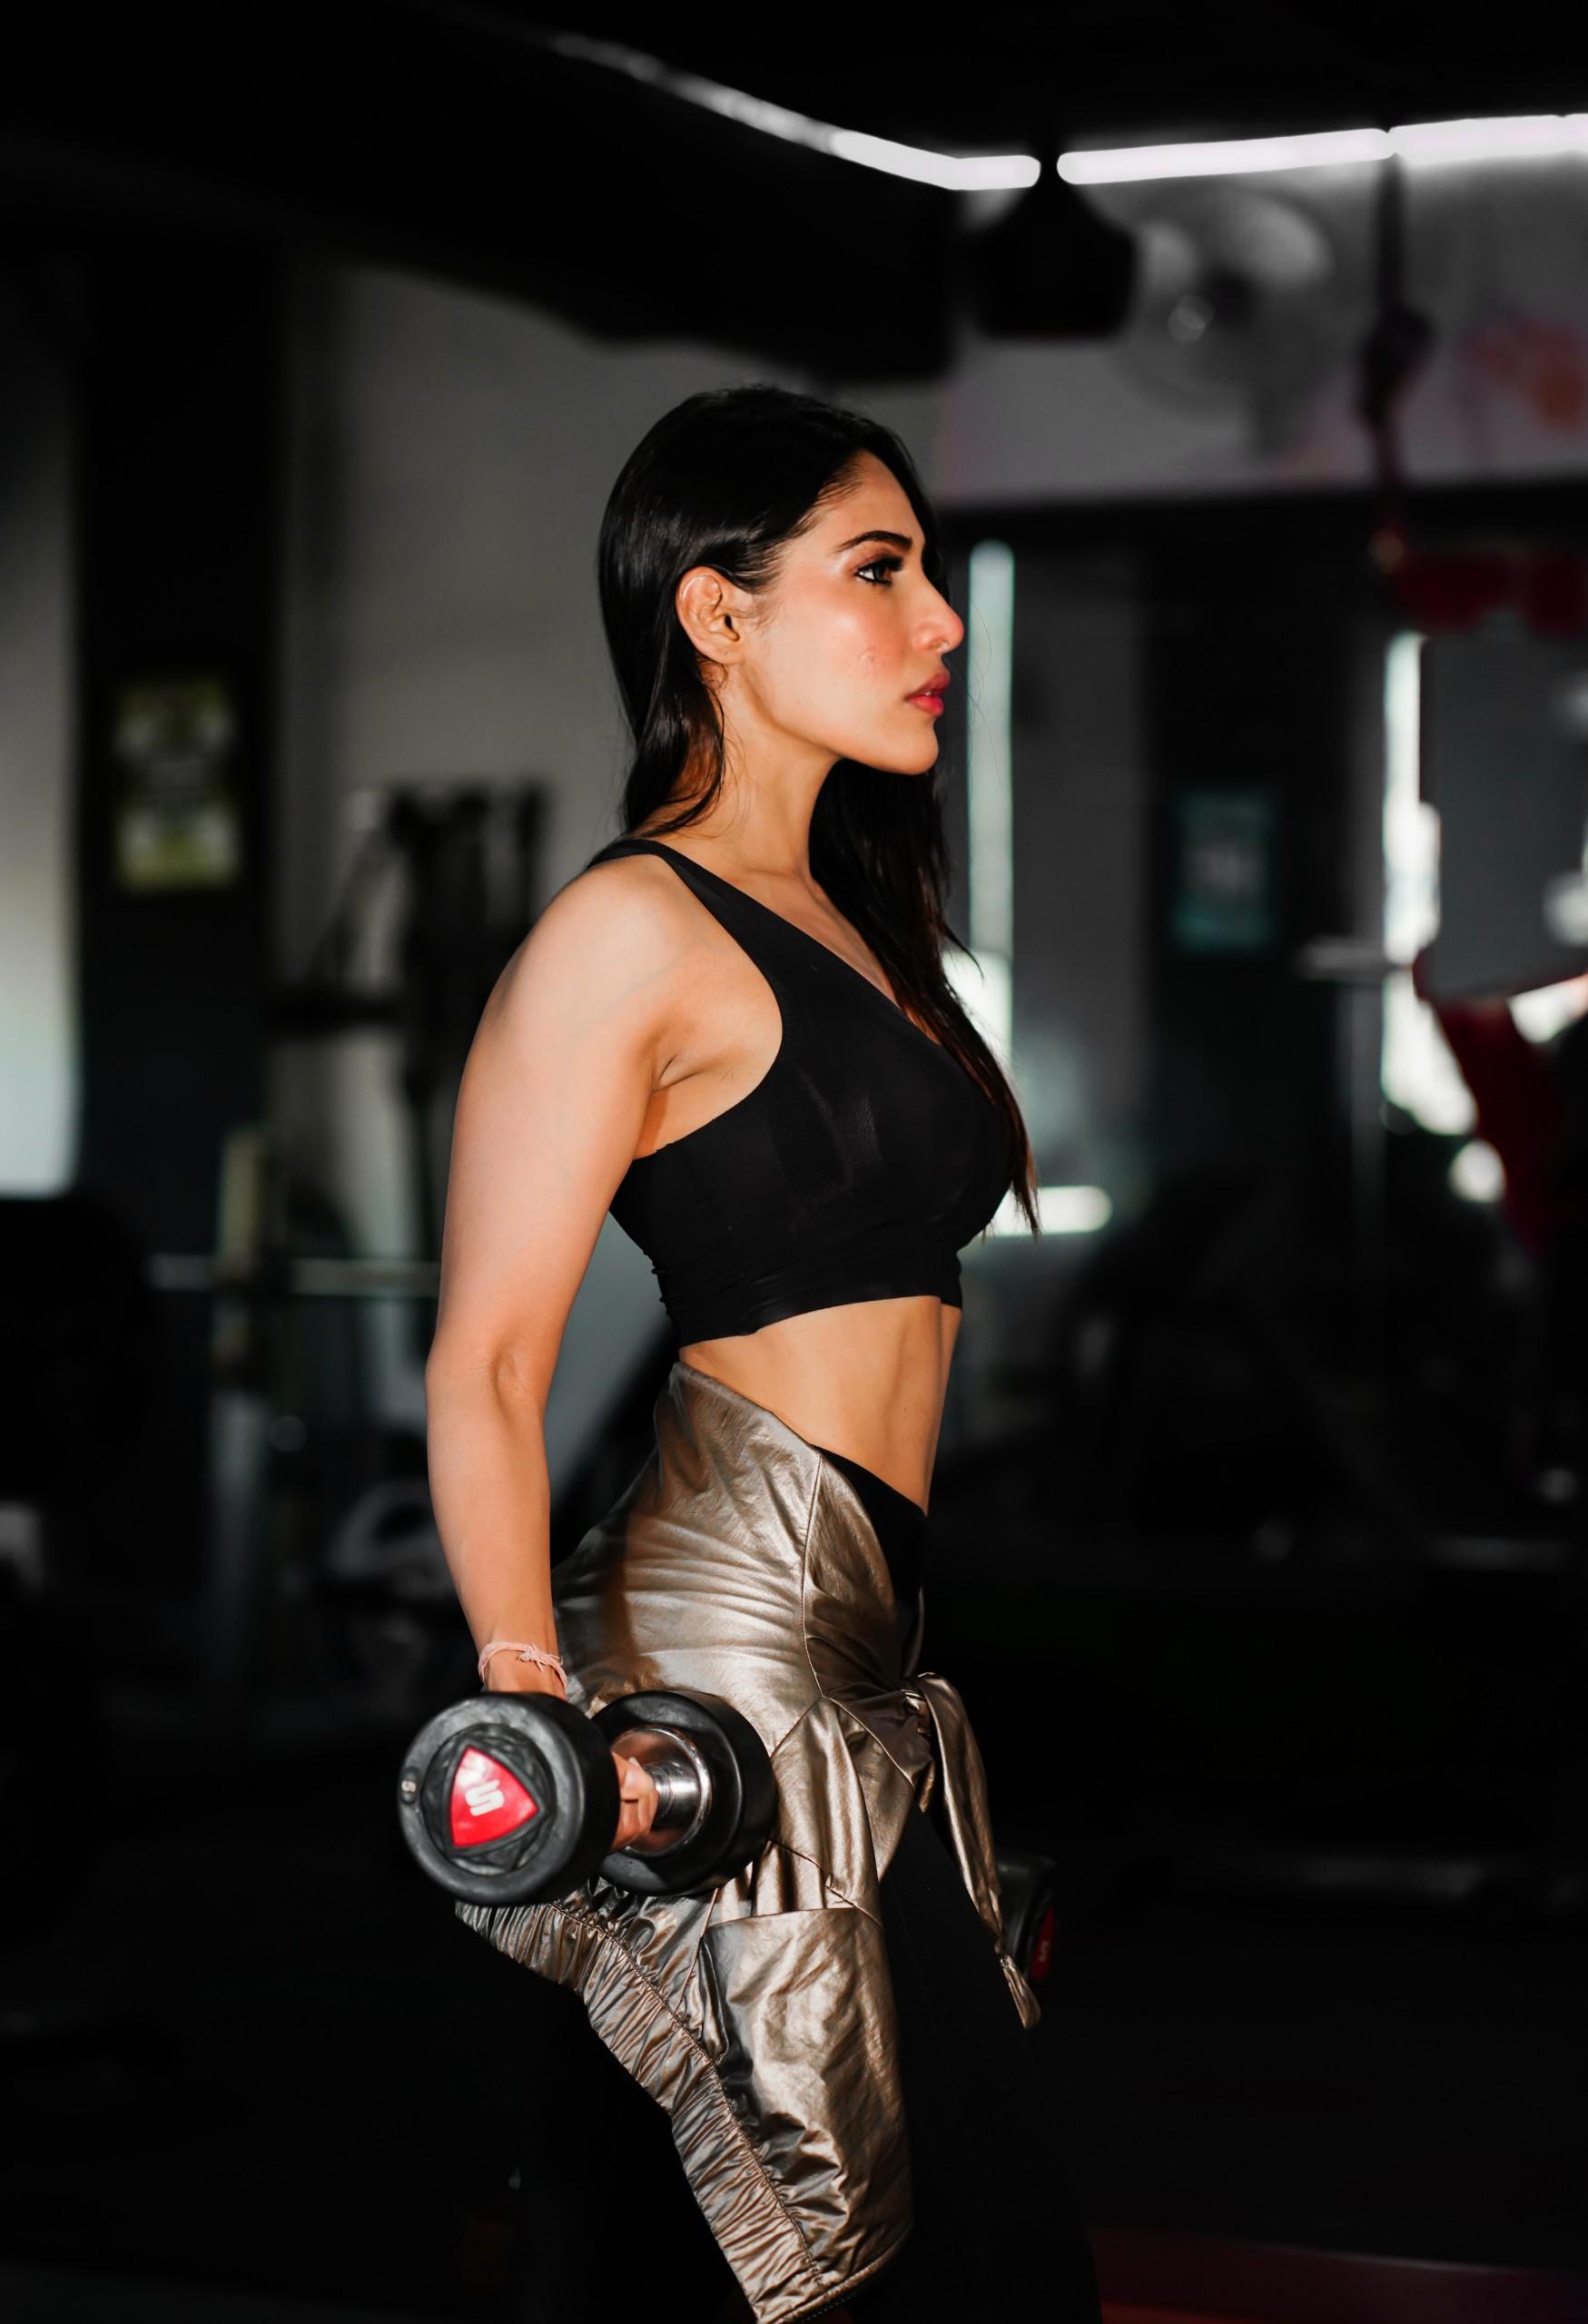 Beautiful female model in gym